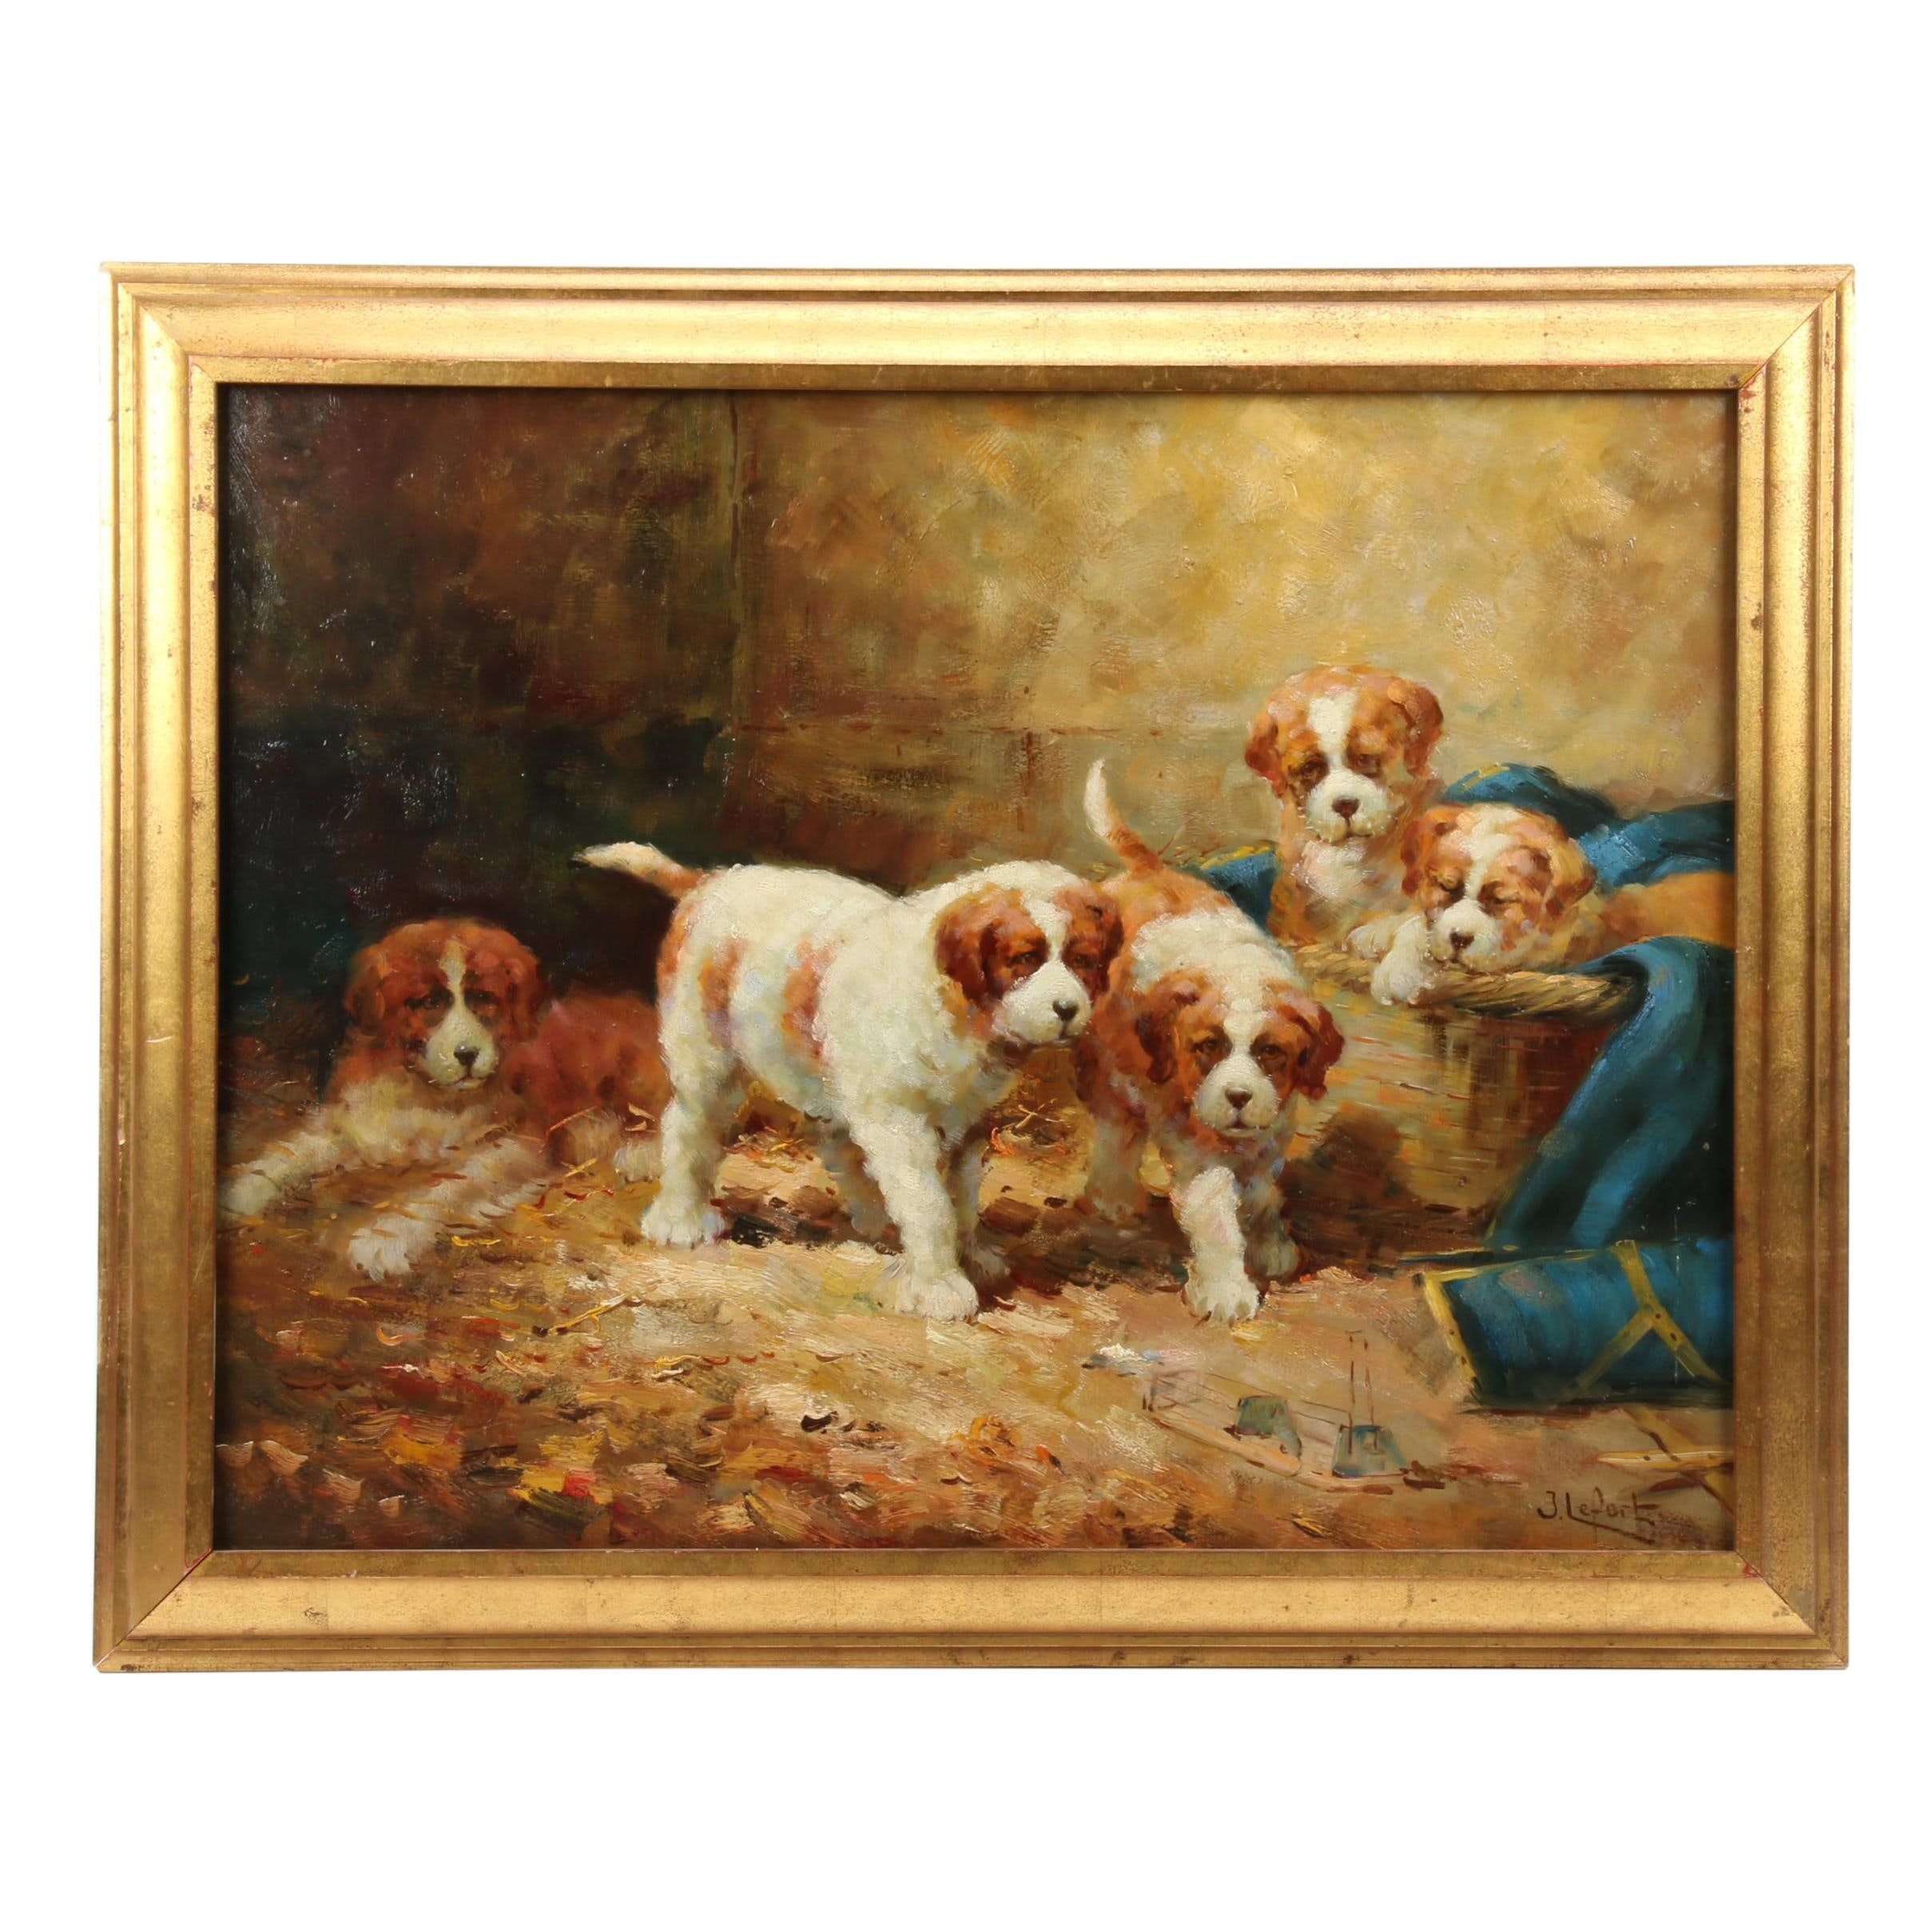 "Jean Lefort Oil Painting ""The Sleepy Puppies"""